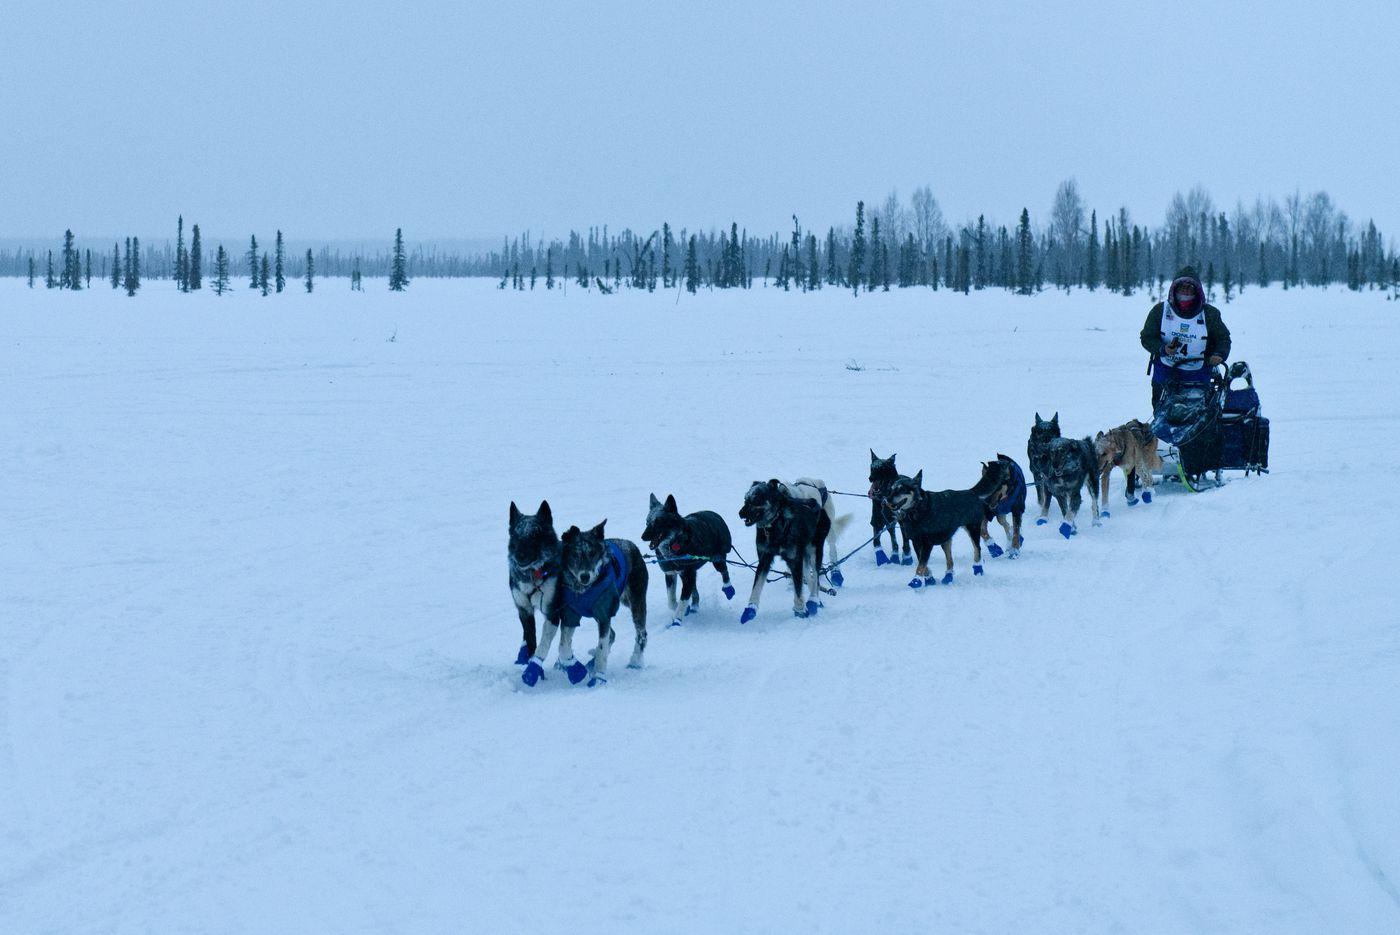 Jessie Royer reaches Deshka Landing to finish Iditarod on March 15, 2021. (Marc Lester / ADN)